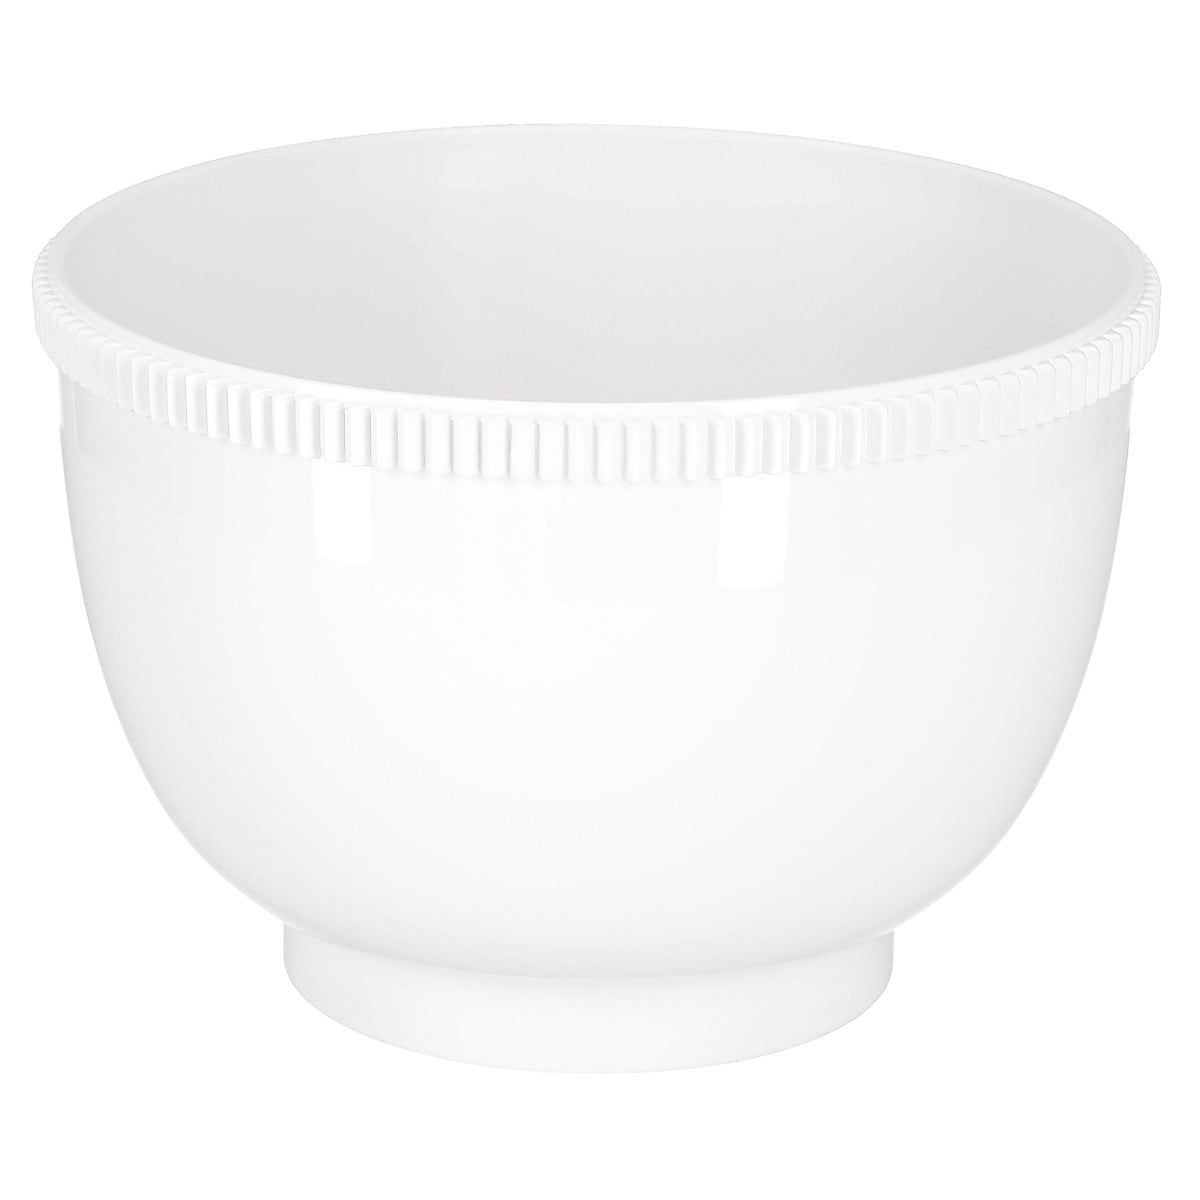 Hand Mixer with Rotating Bowl